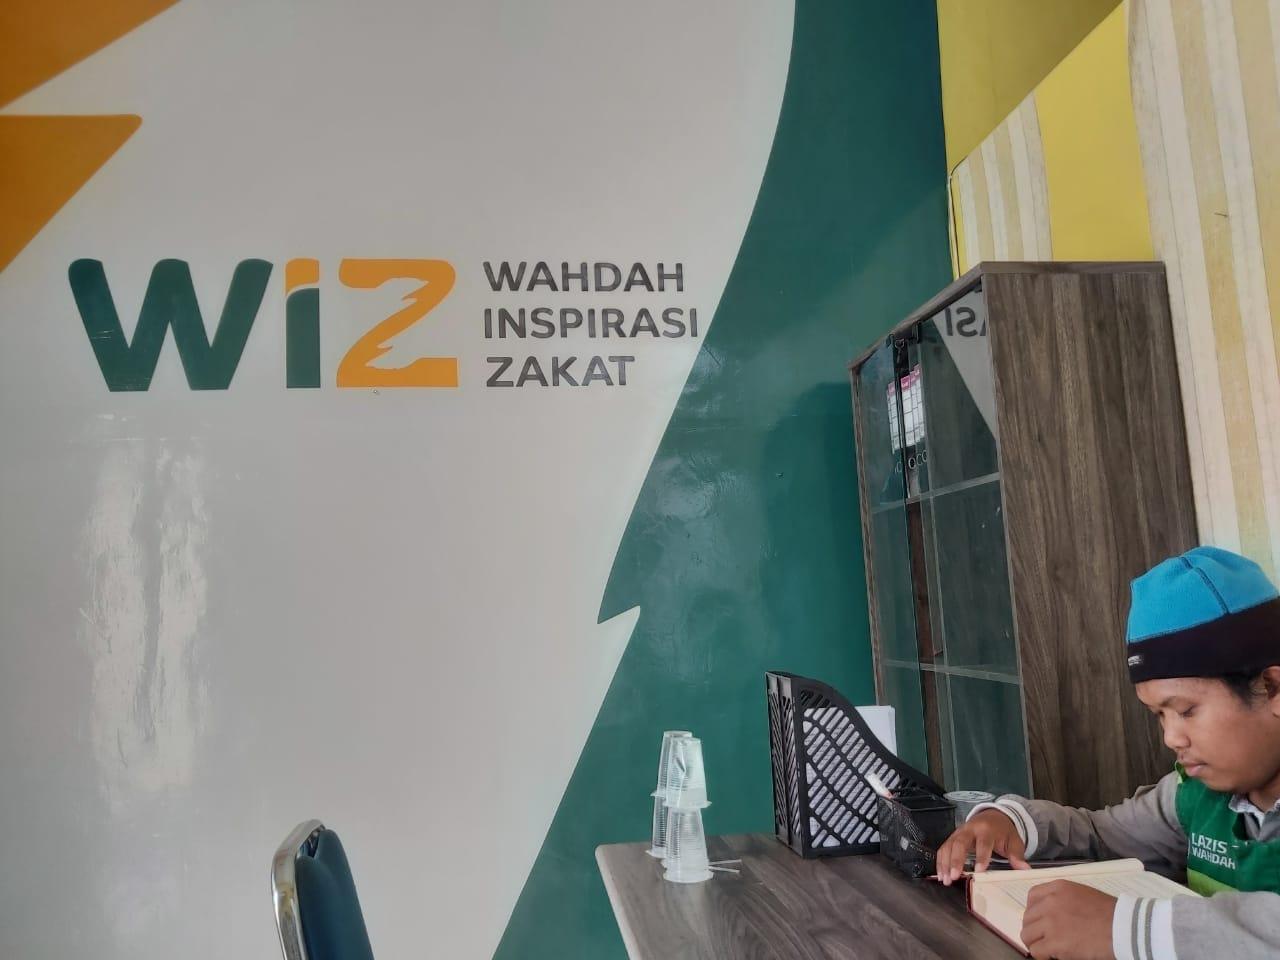 Kantor Wahdah Inspirasi Zakat Wiz Cabang Luwuk Banggai Resmi Dibuka